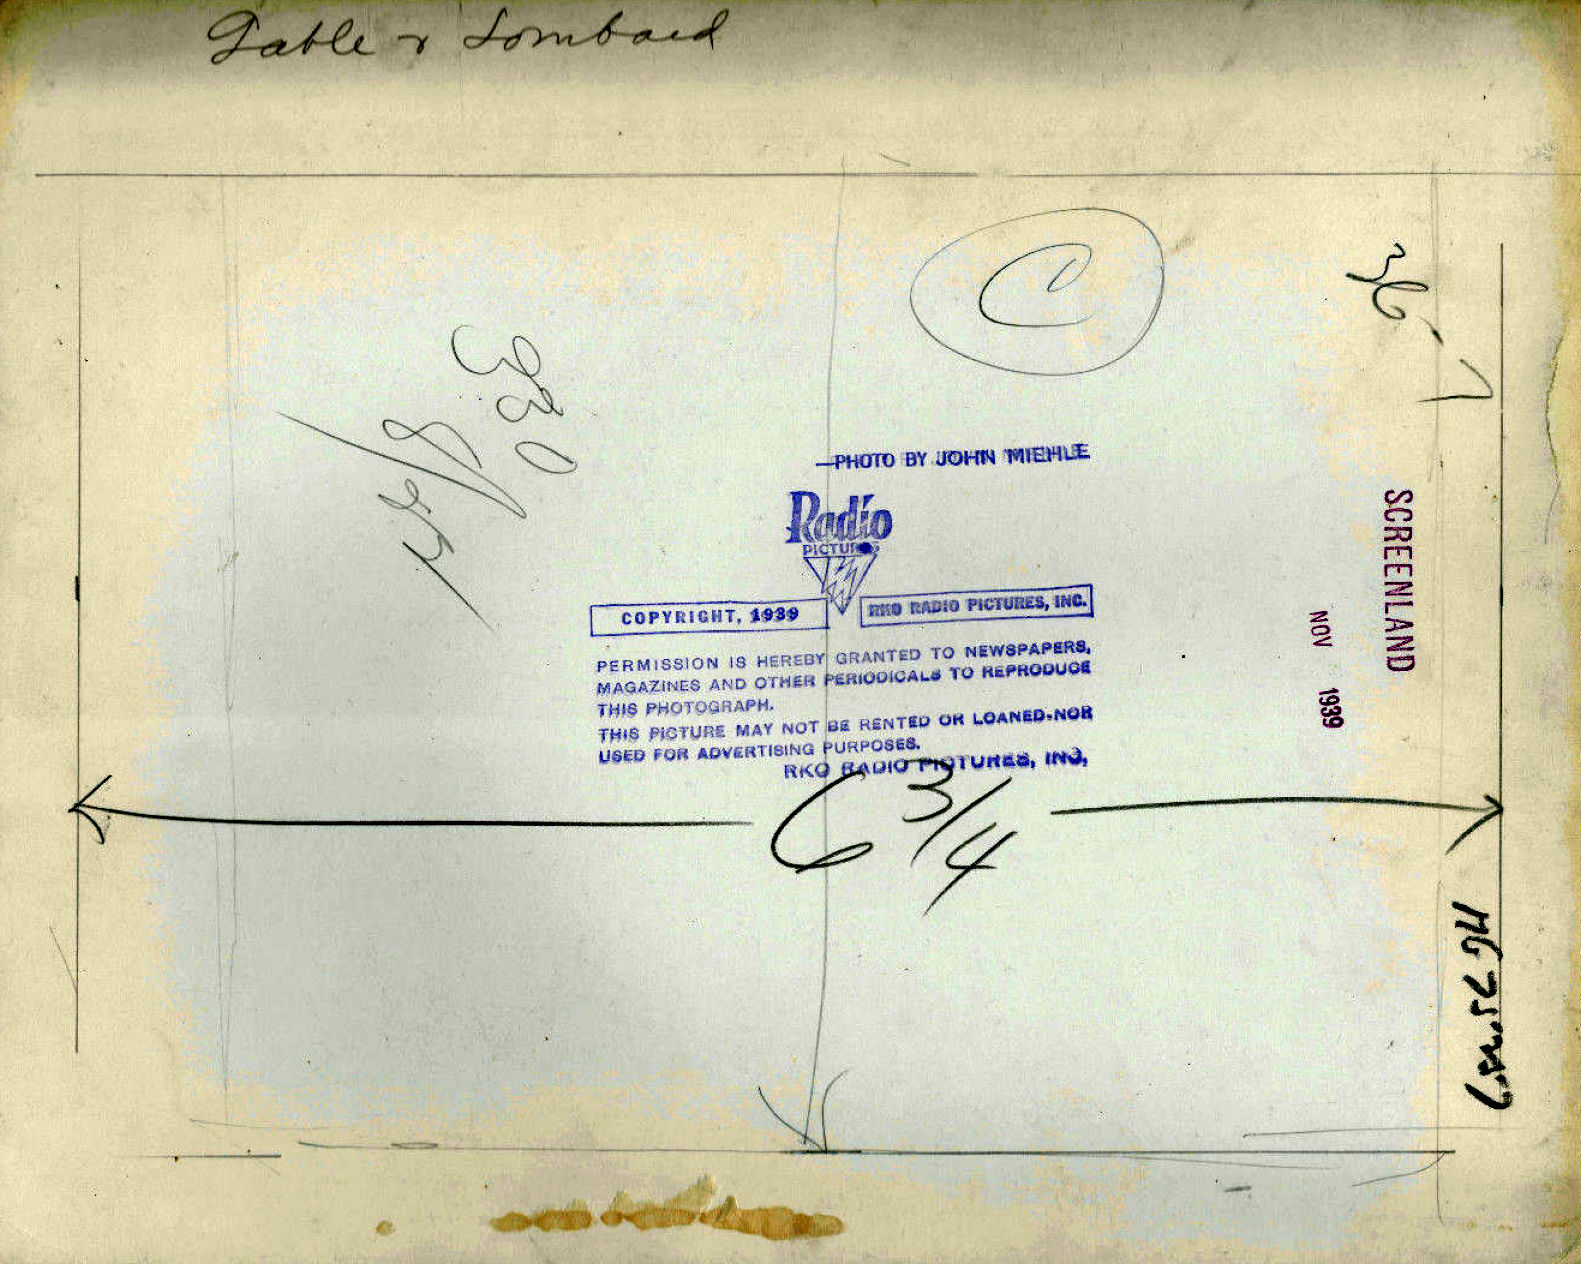 carole lombard clark gable screenland november 1939a back